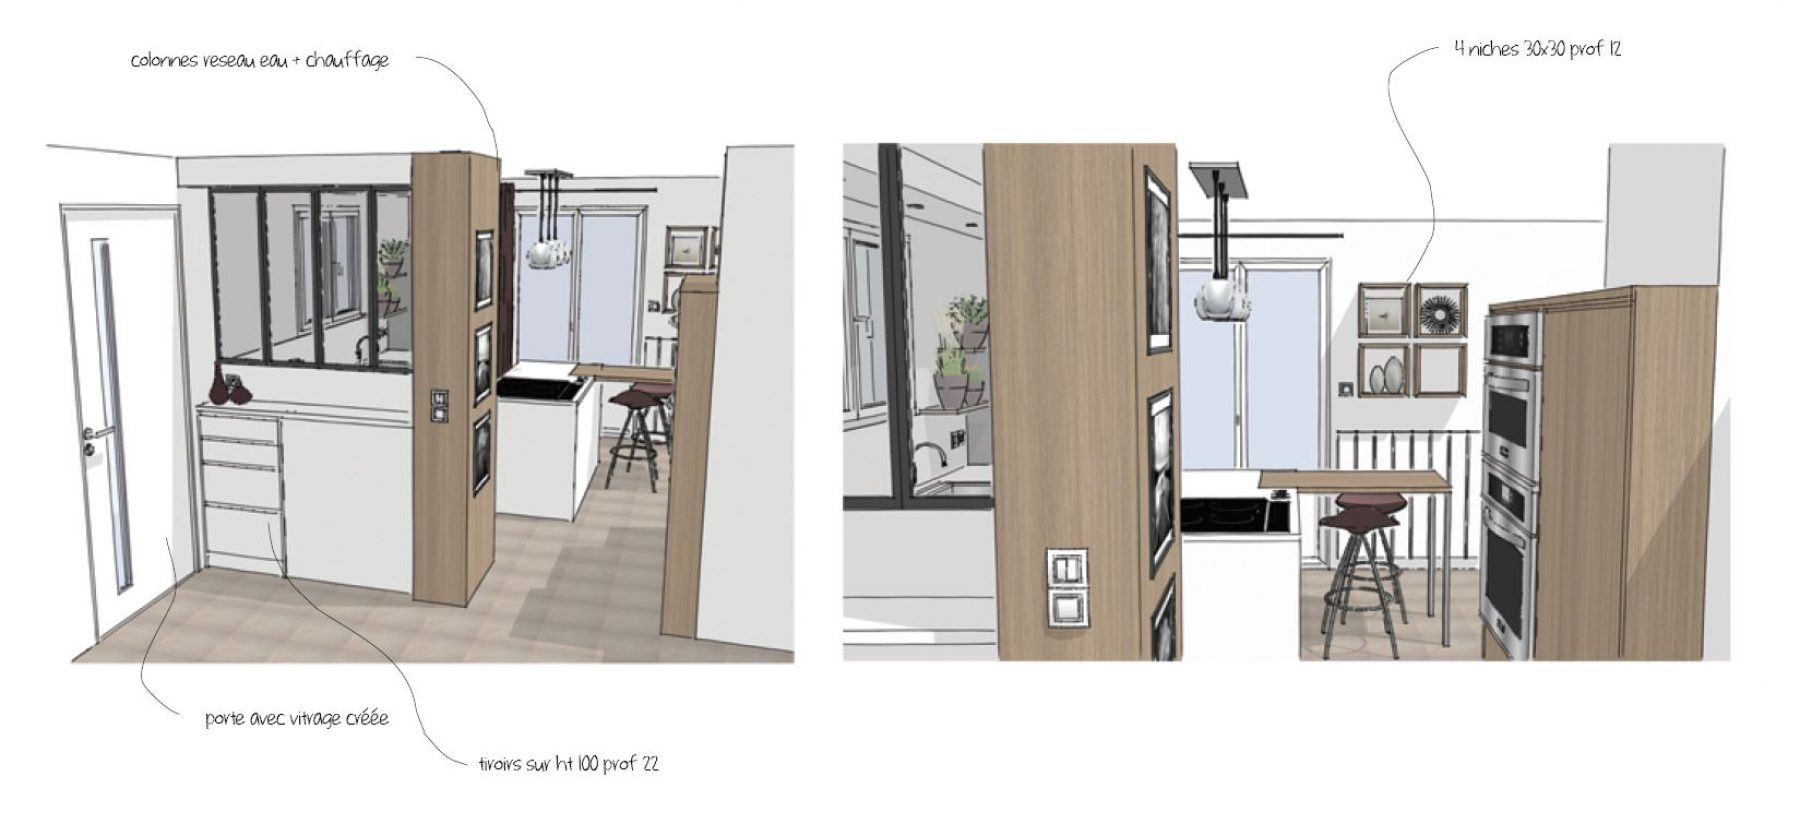 chez colette cuisine seynod chez colette cuisine seynod. Black Bedroom Furniture Sets. Home Design Ideas